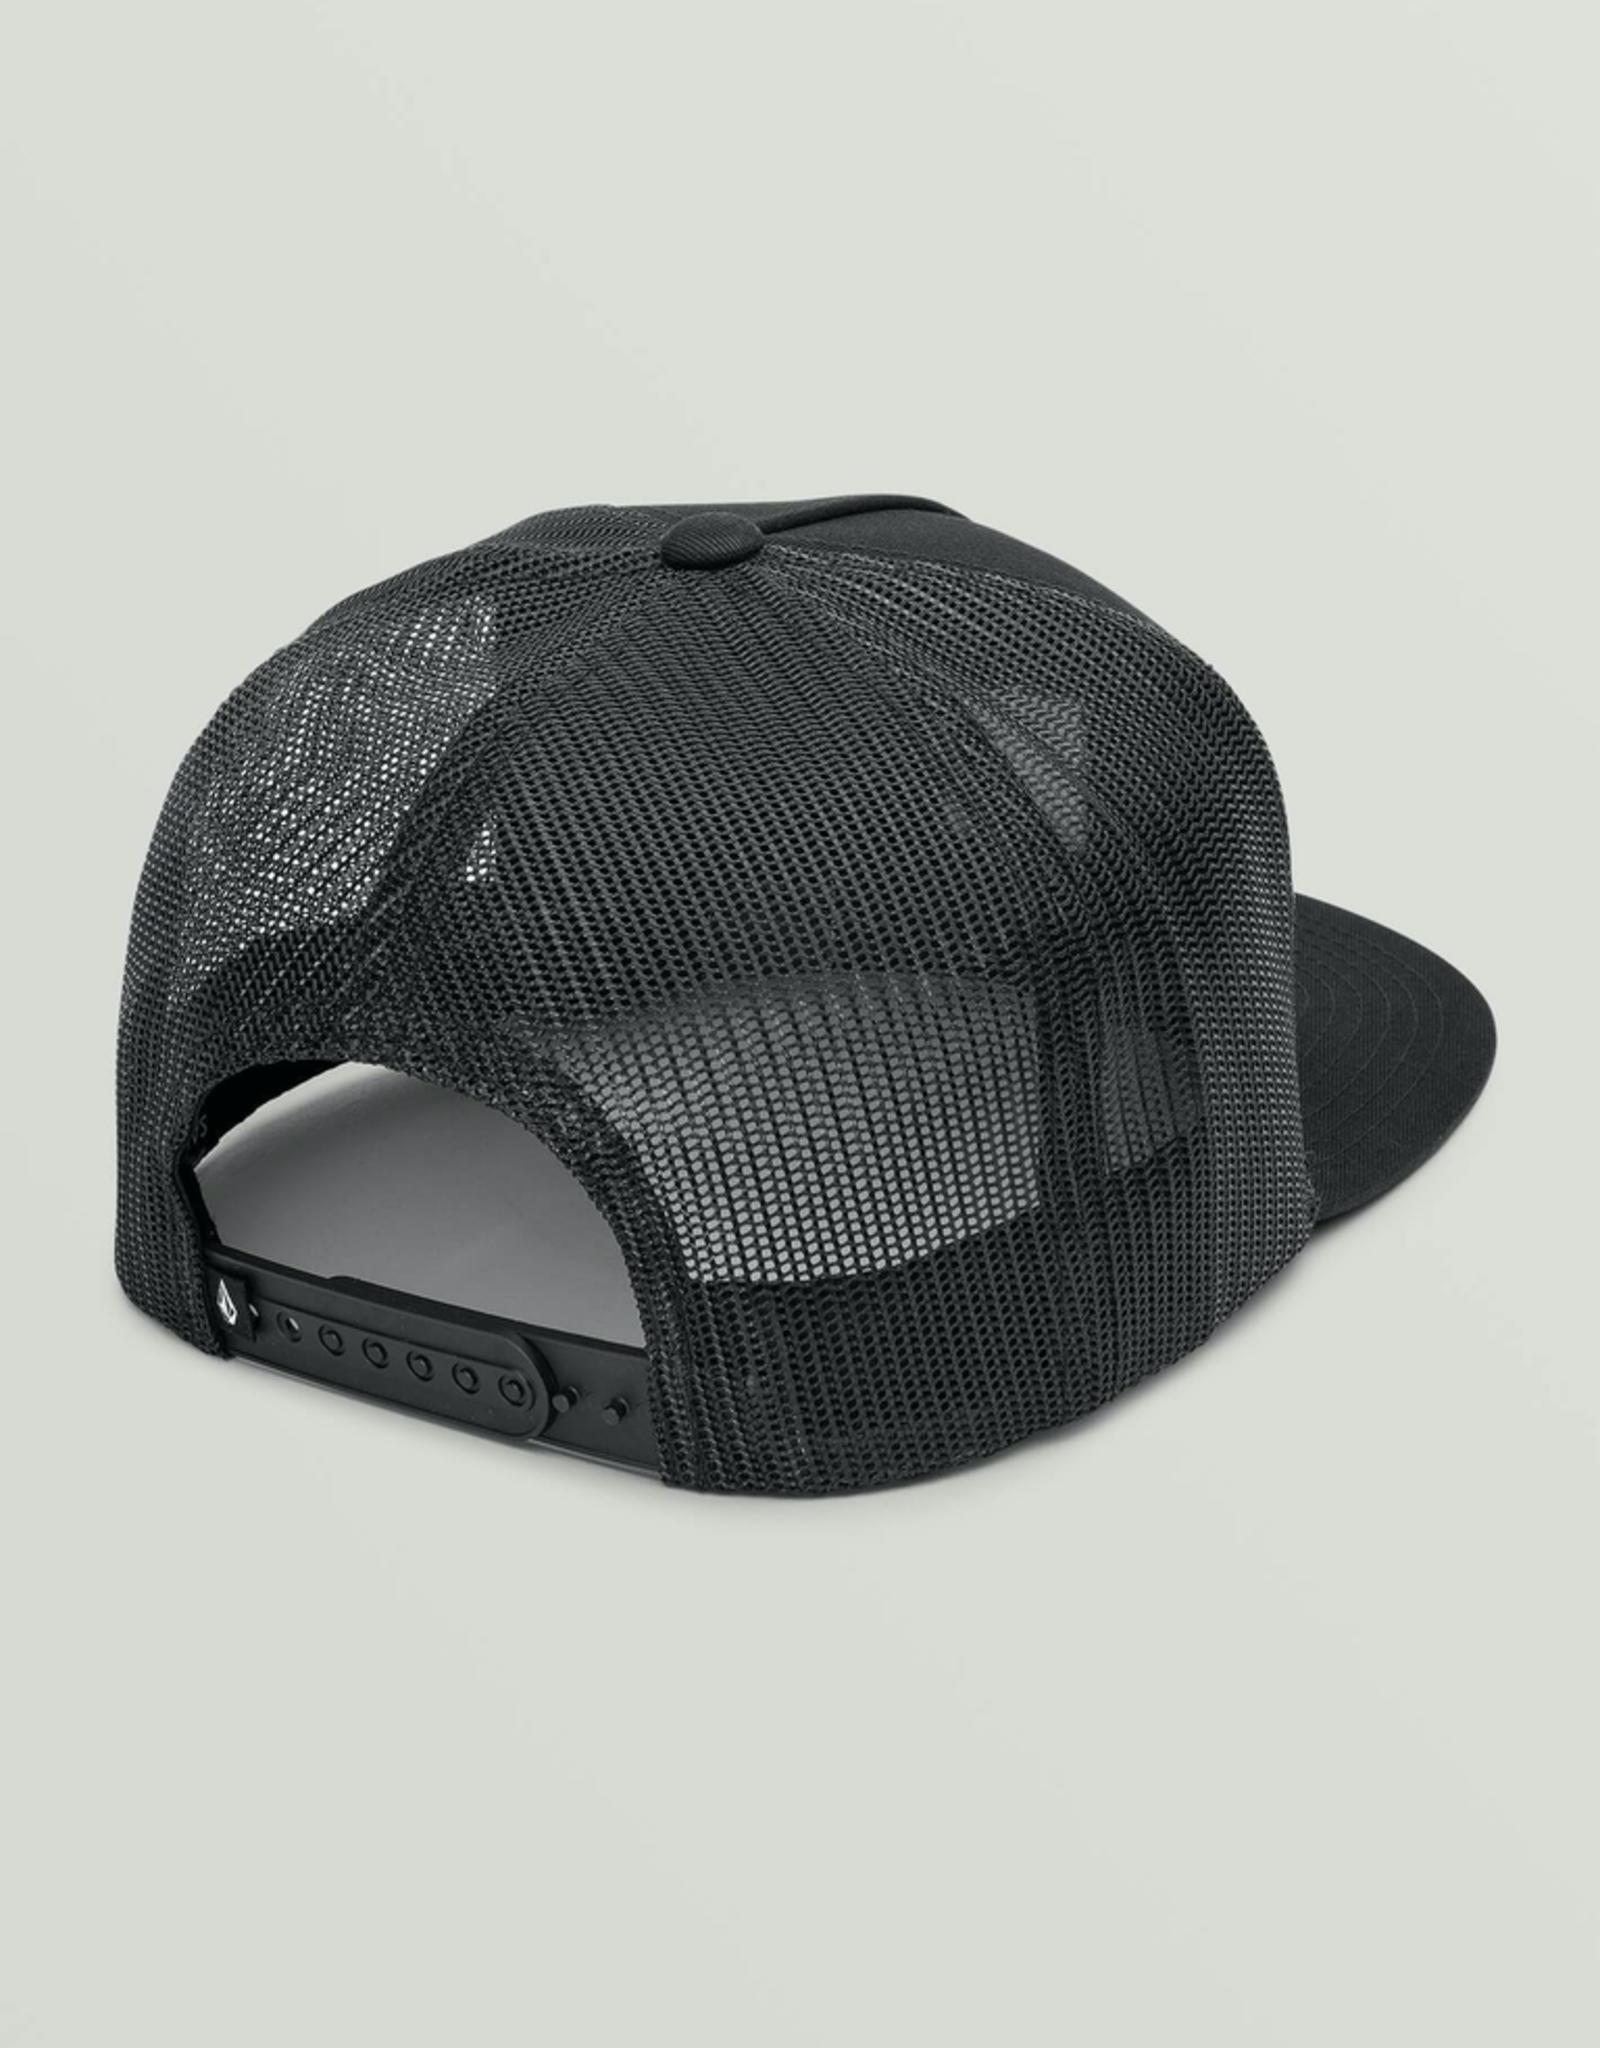 Box Stone Cheese Hat - Black